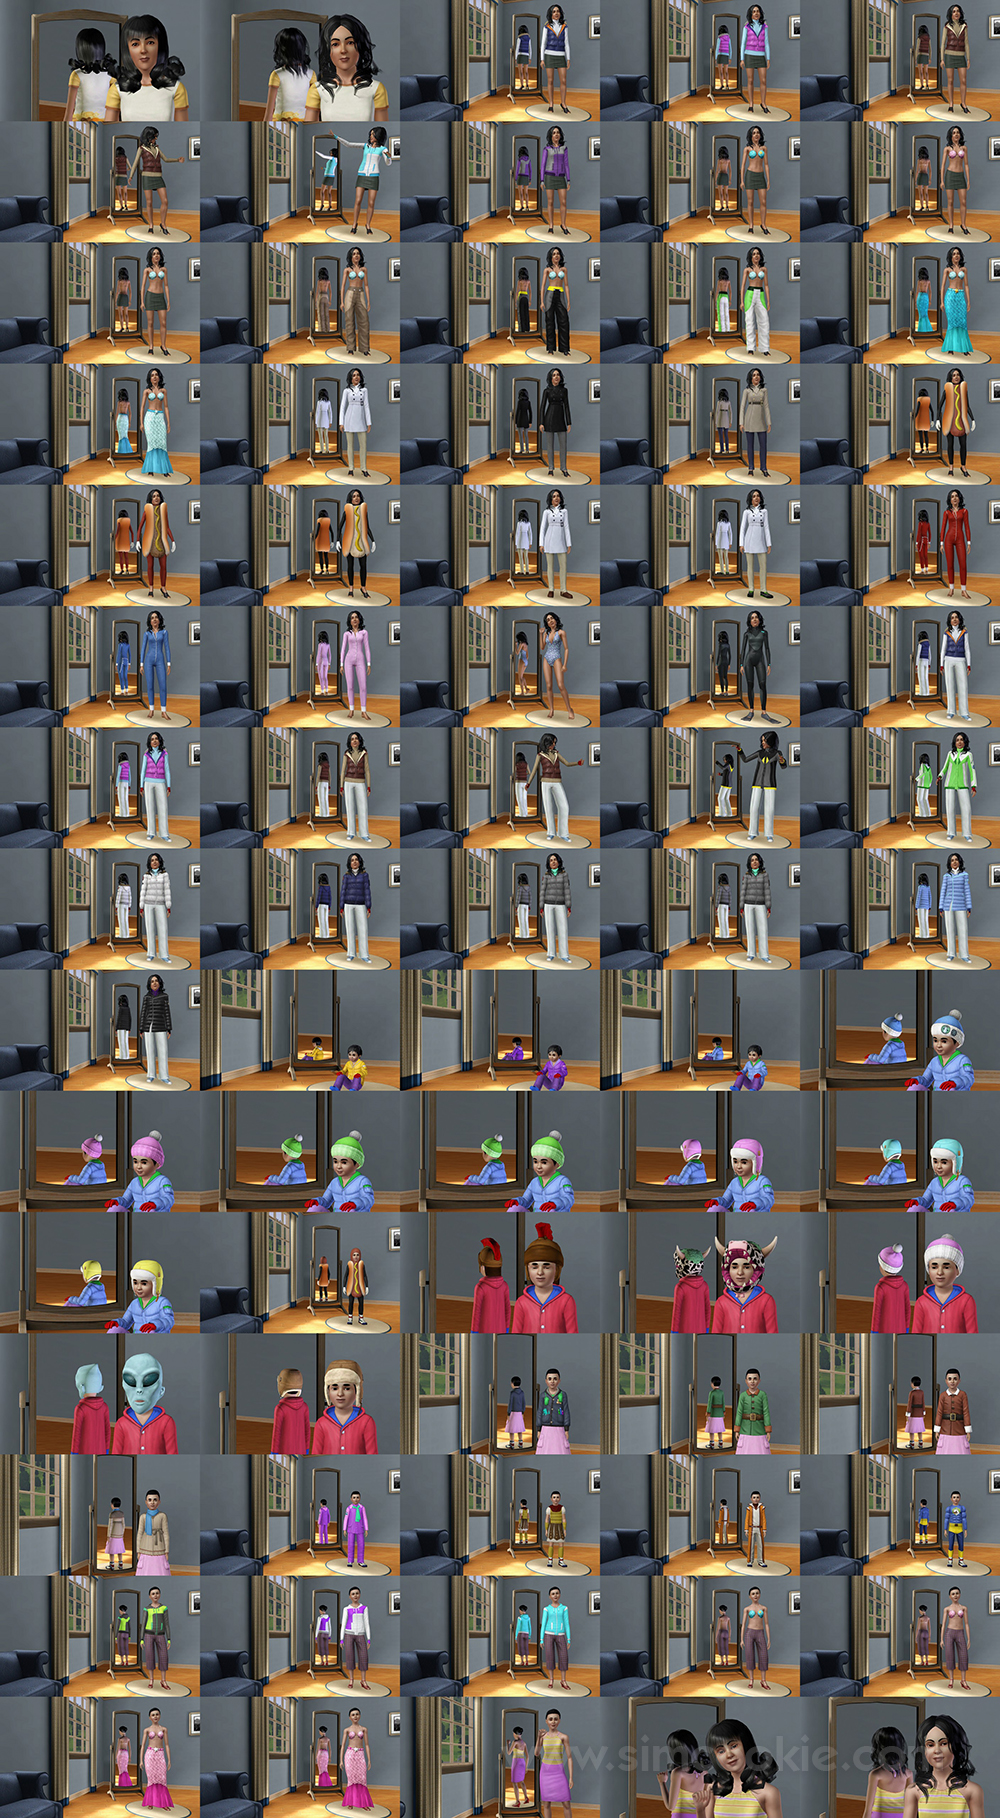 the-sims-3-seasons_20121028_1397195351.jpg